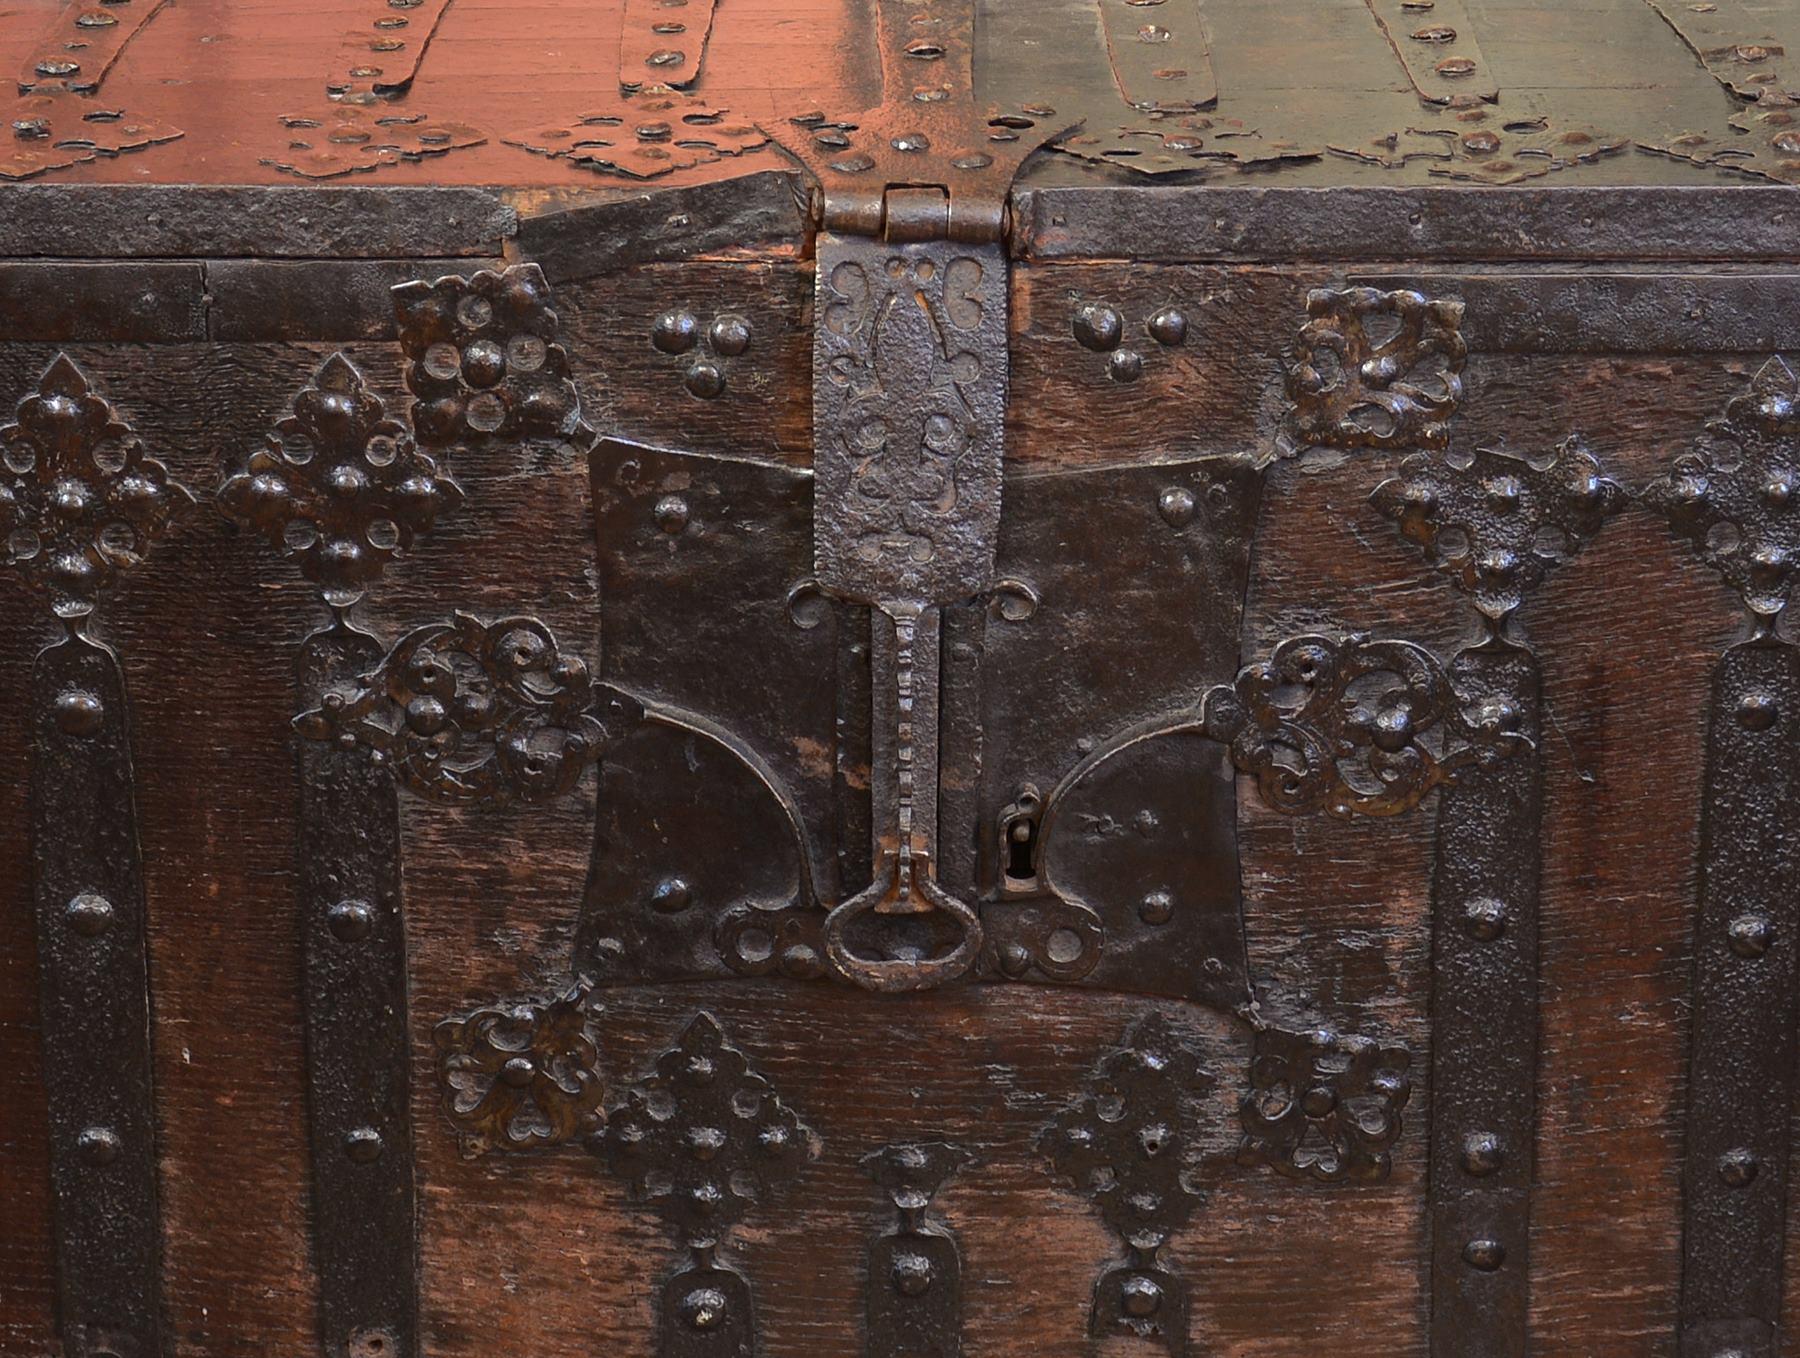 Gothic chest | Robert-Art